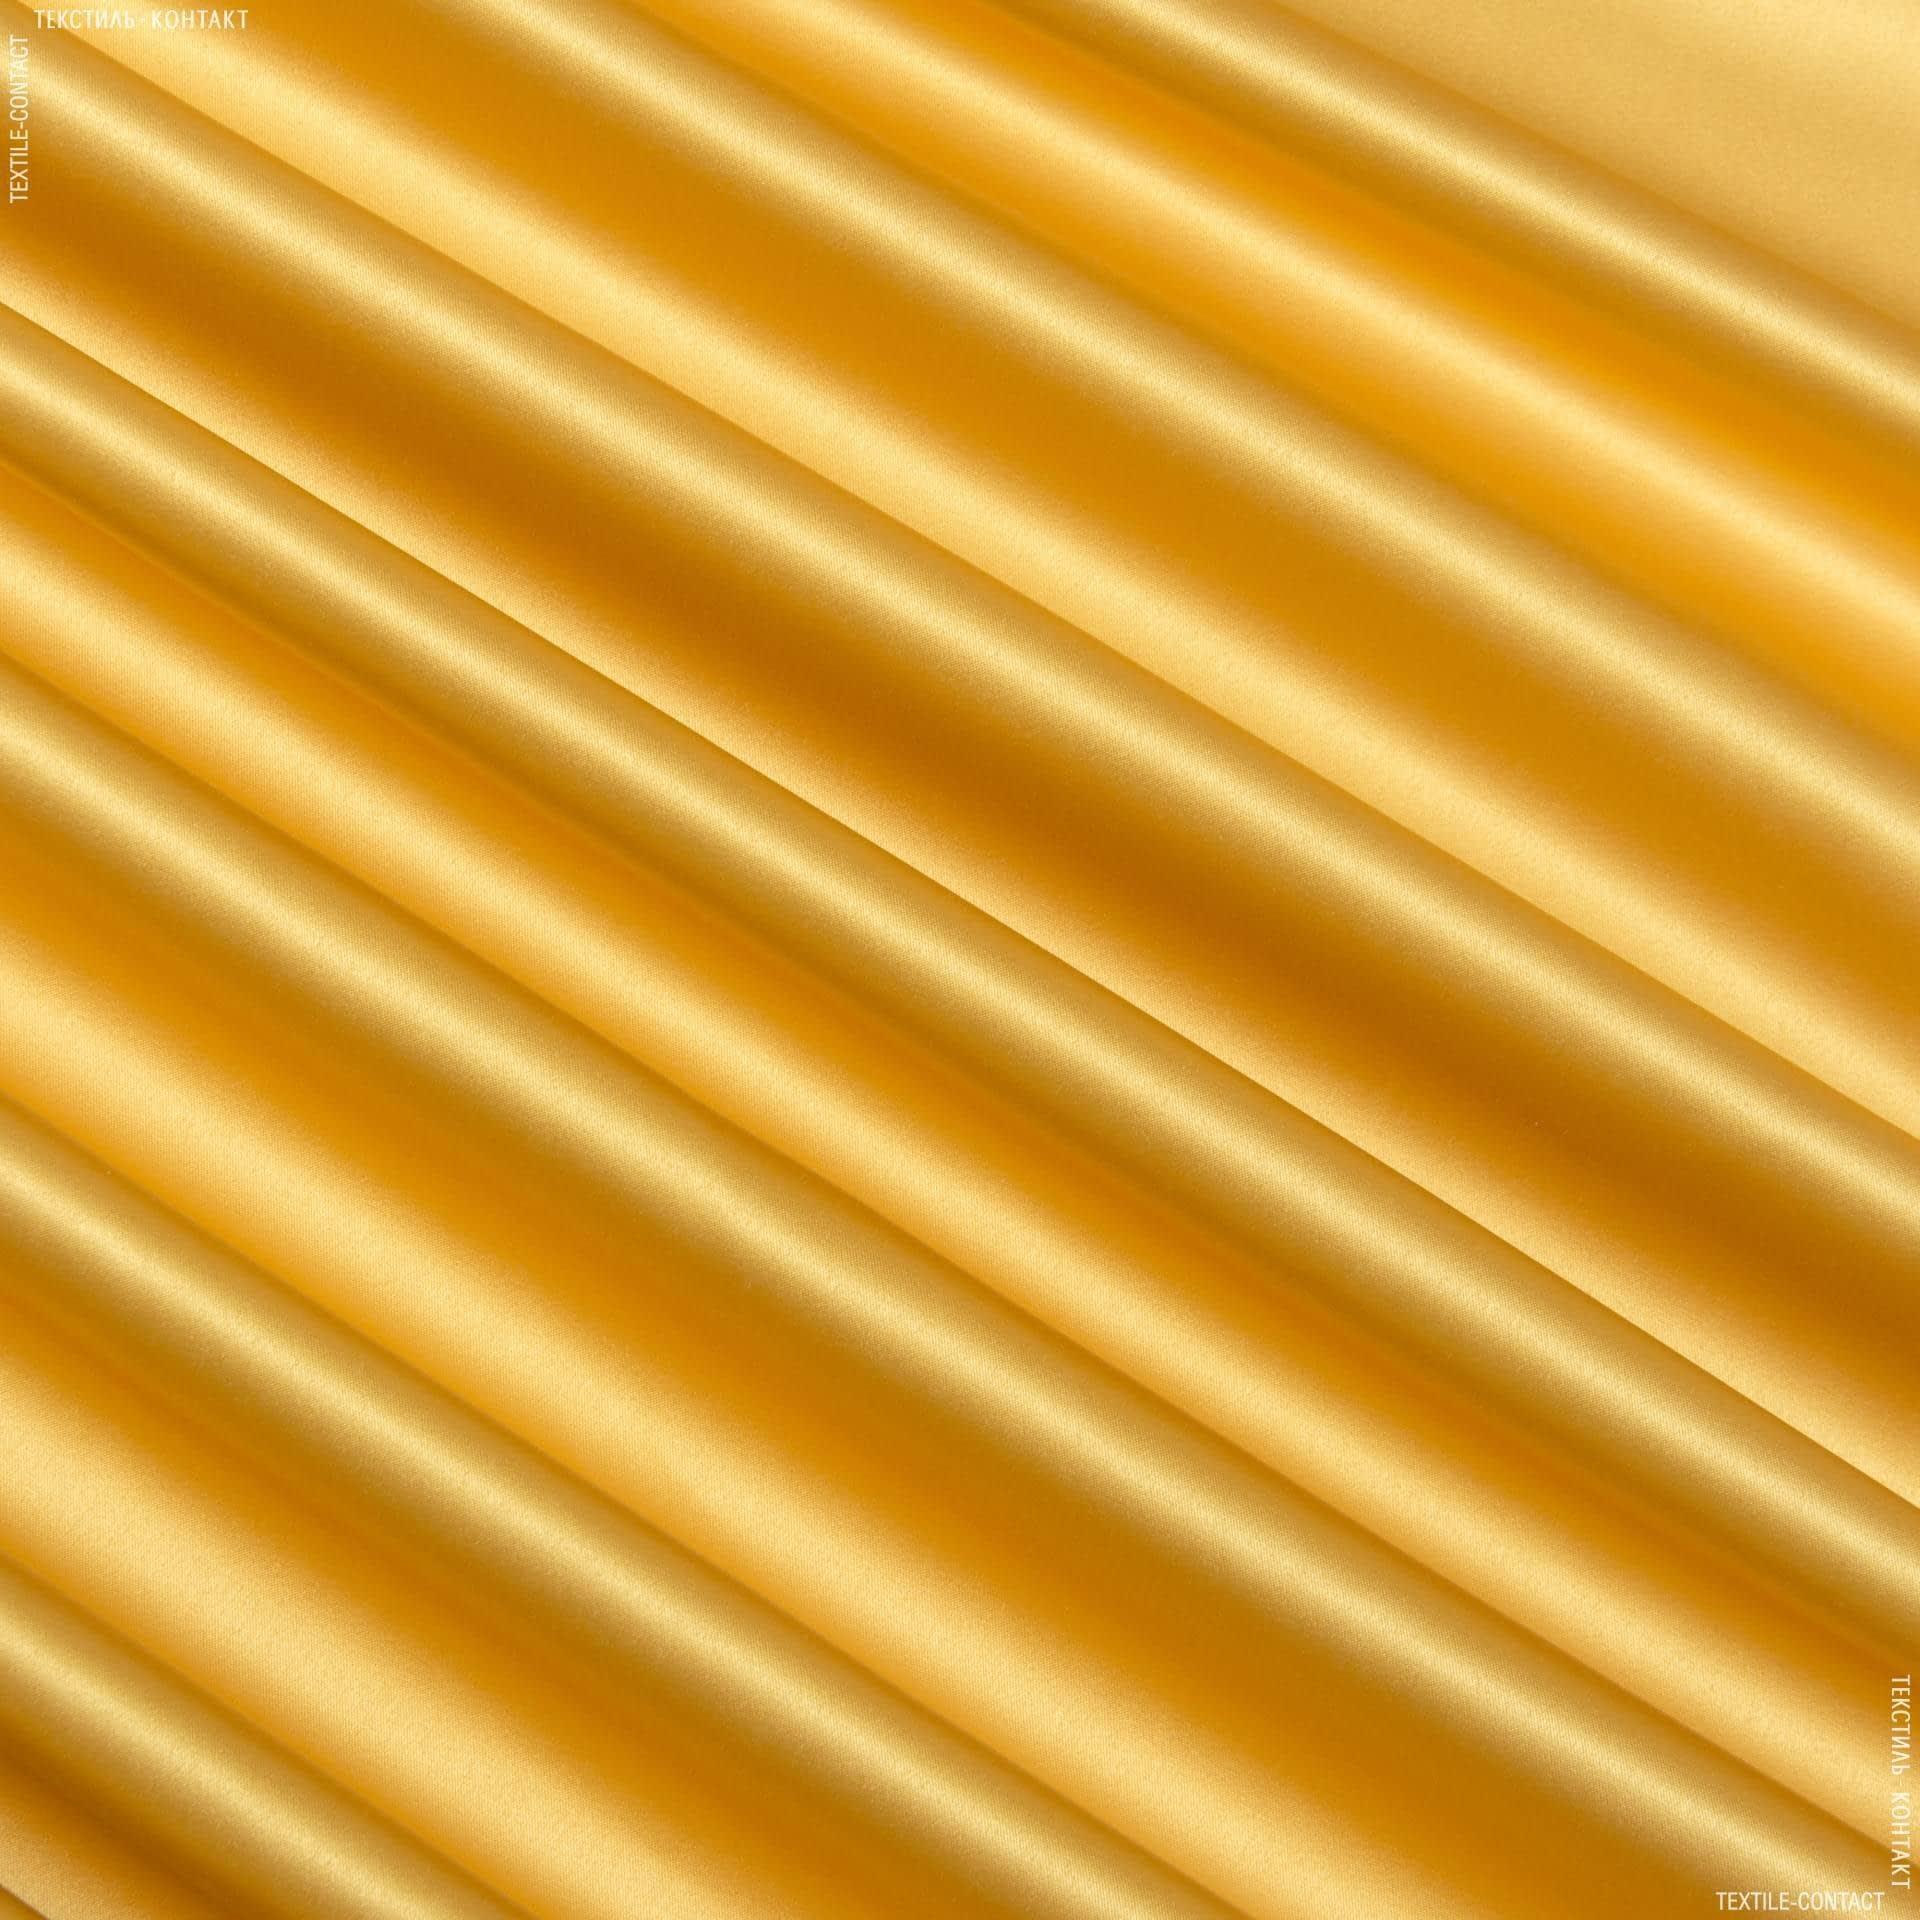 Ткани для платков и бандан - Атлас стрейч охра